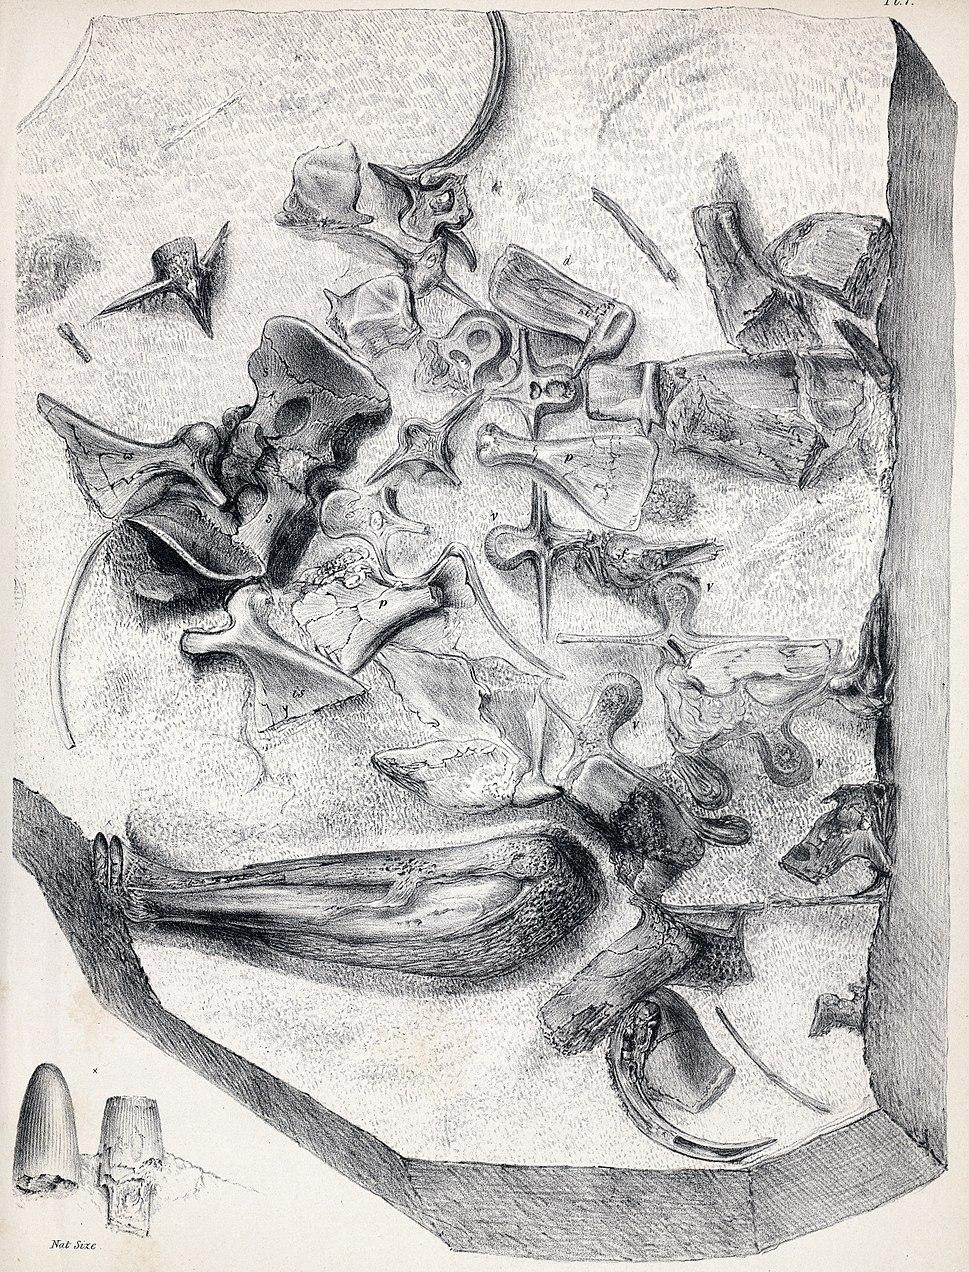 Goniopholis crassidens